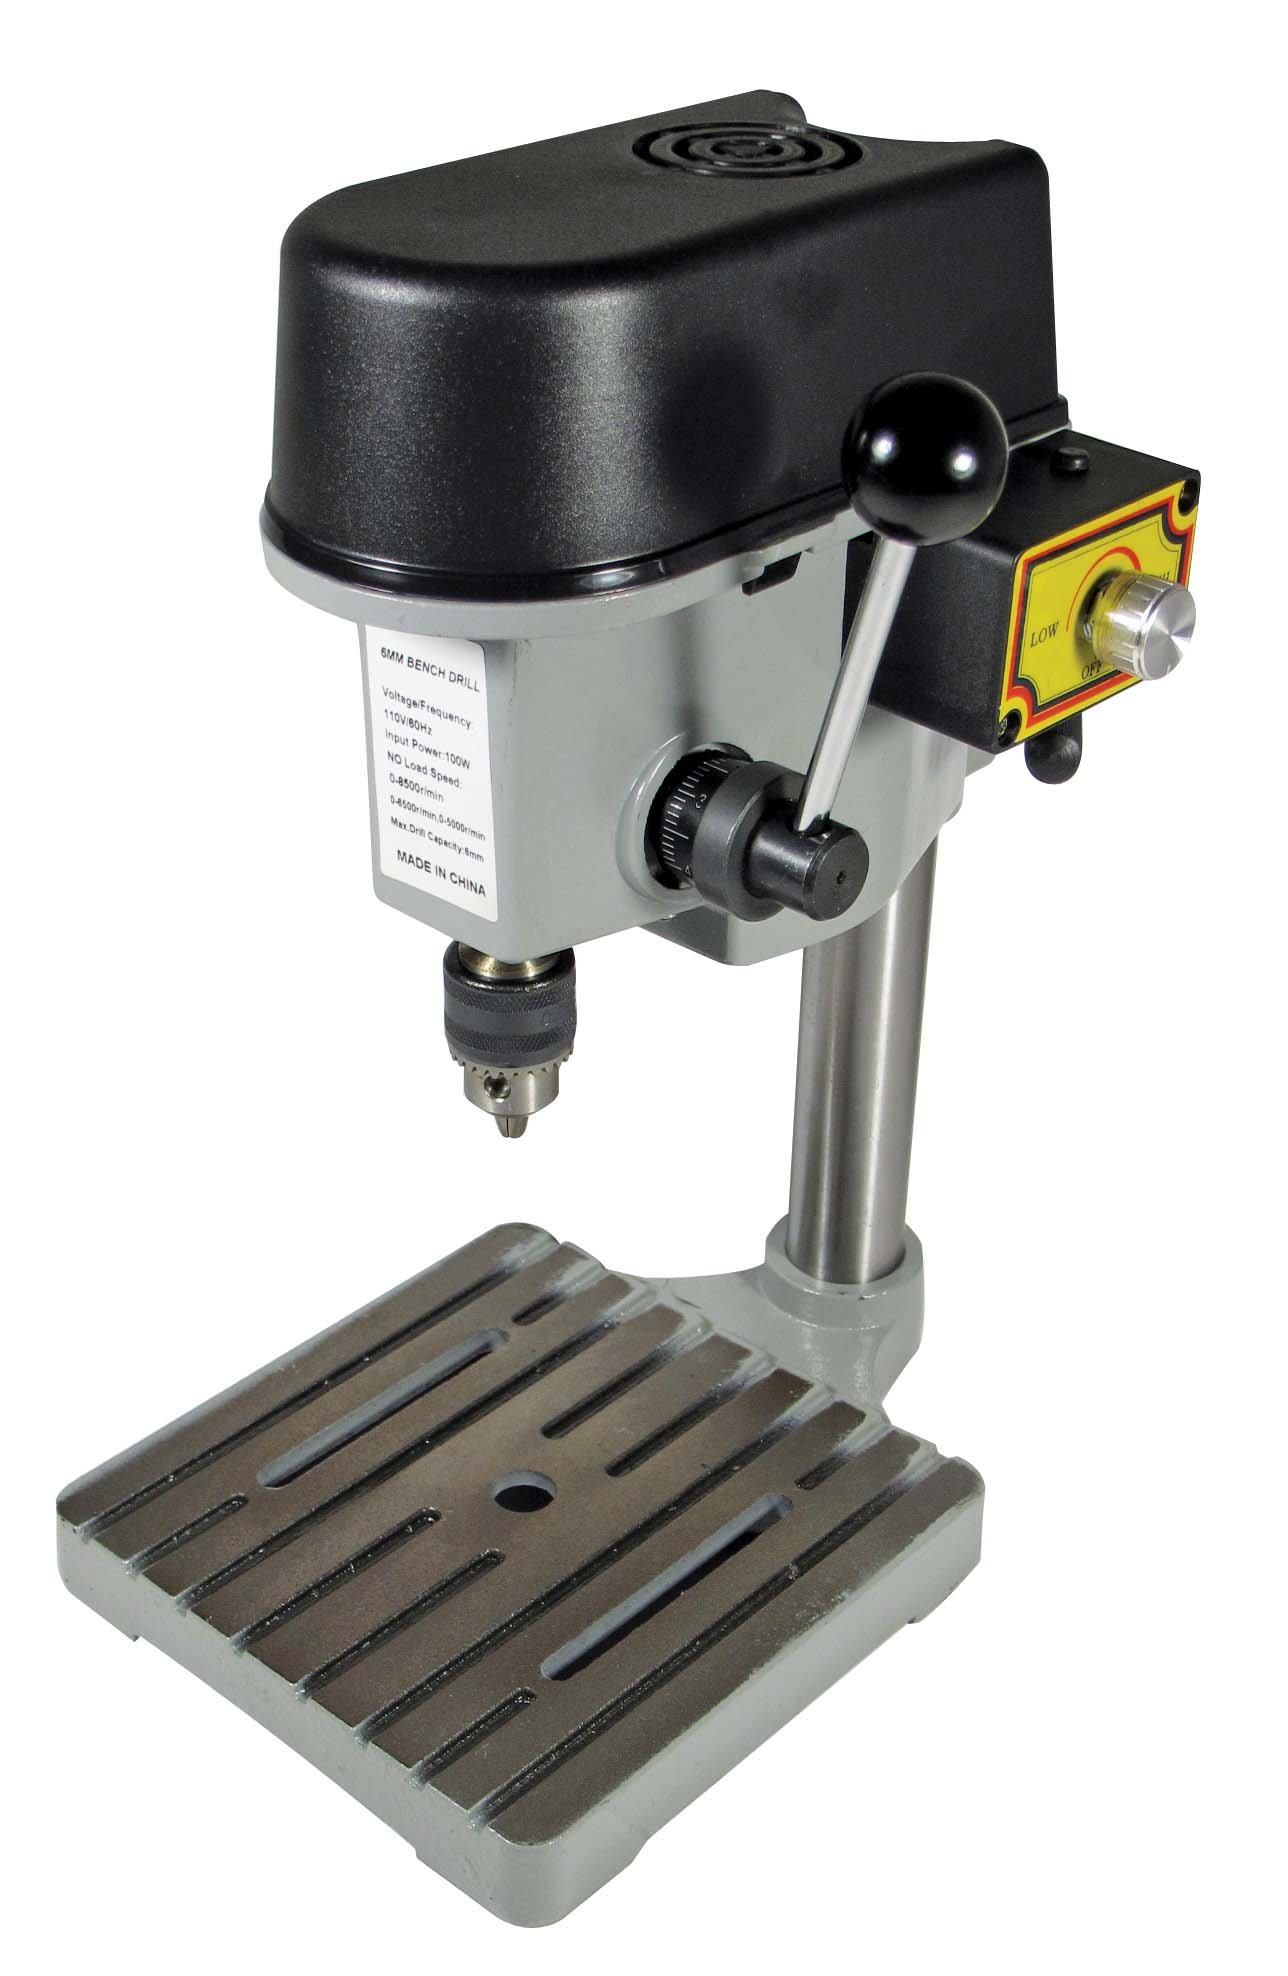 SE 3-Speed Mini Drill Press Bench by SE (Image #1)